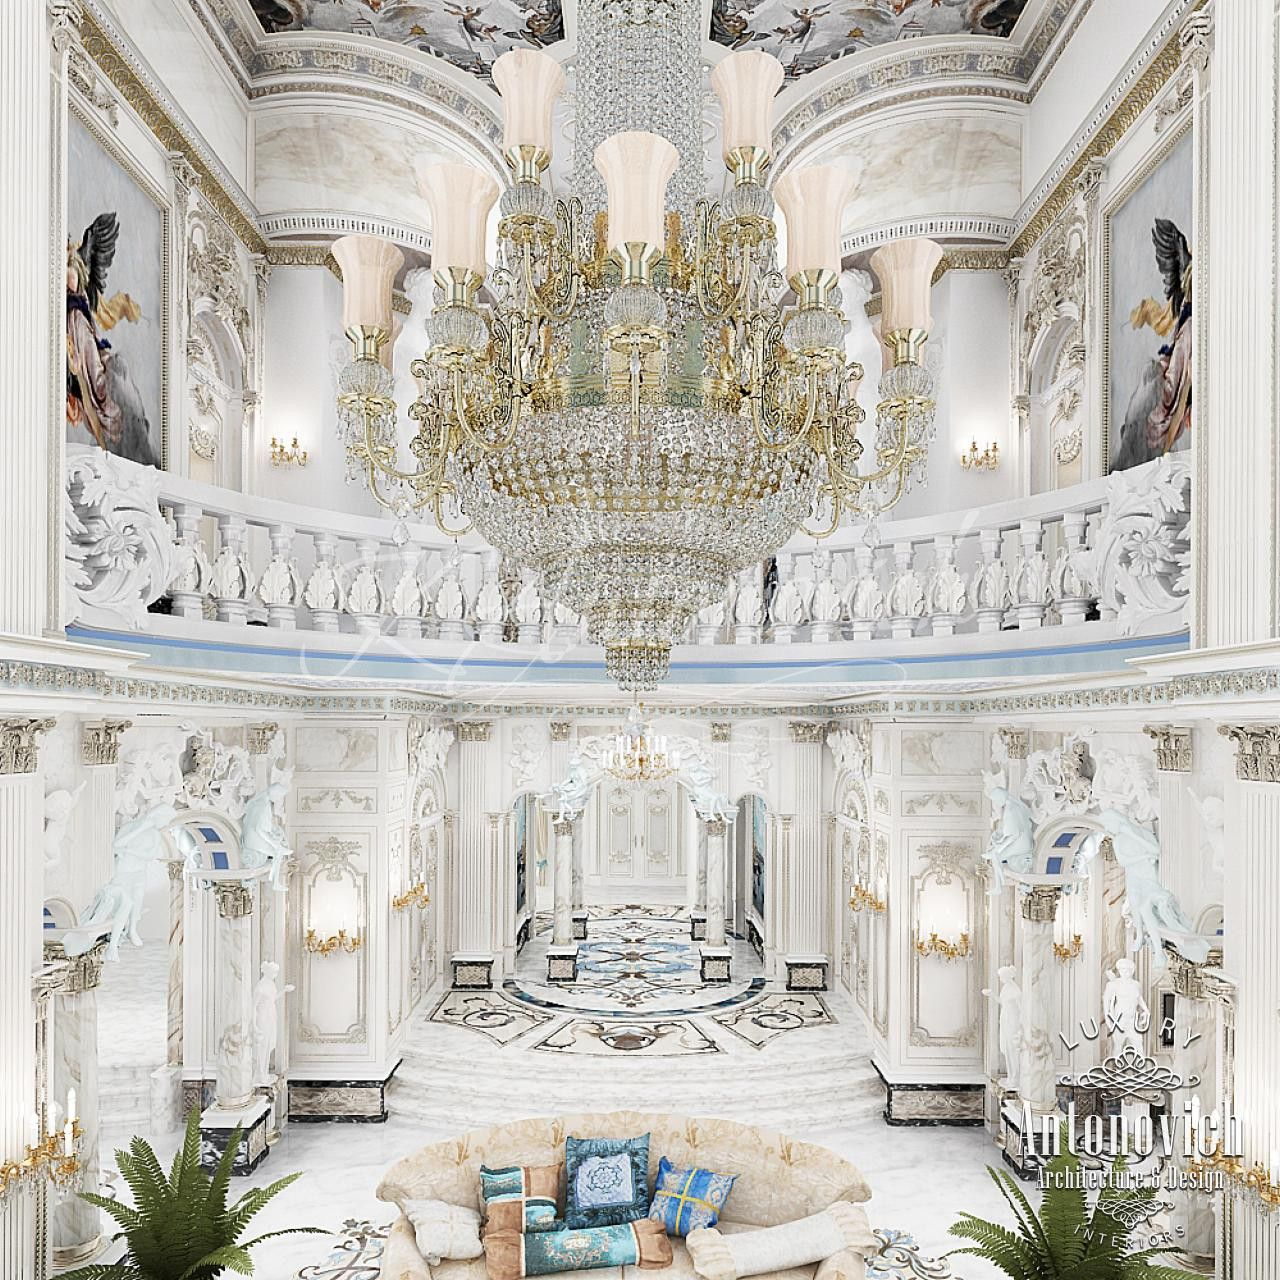 Private Palace Interior Design: Luxury Homes, Luxury Home Decor, Luxury